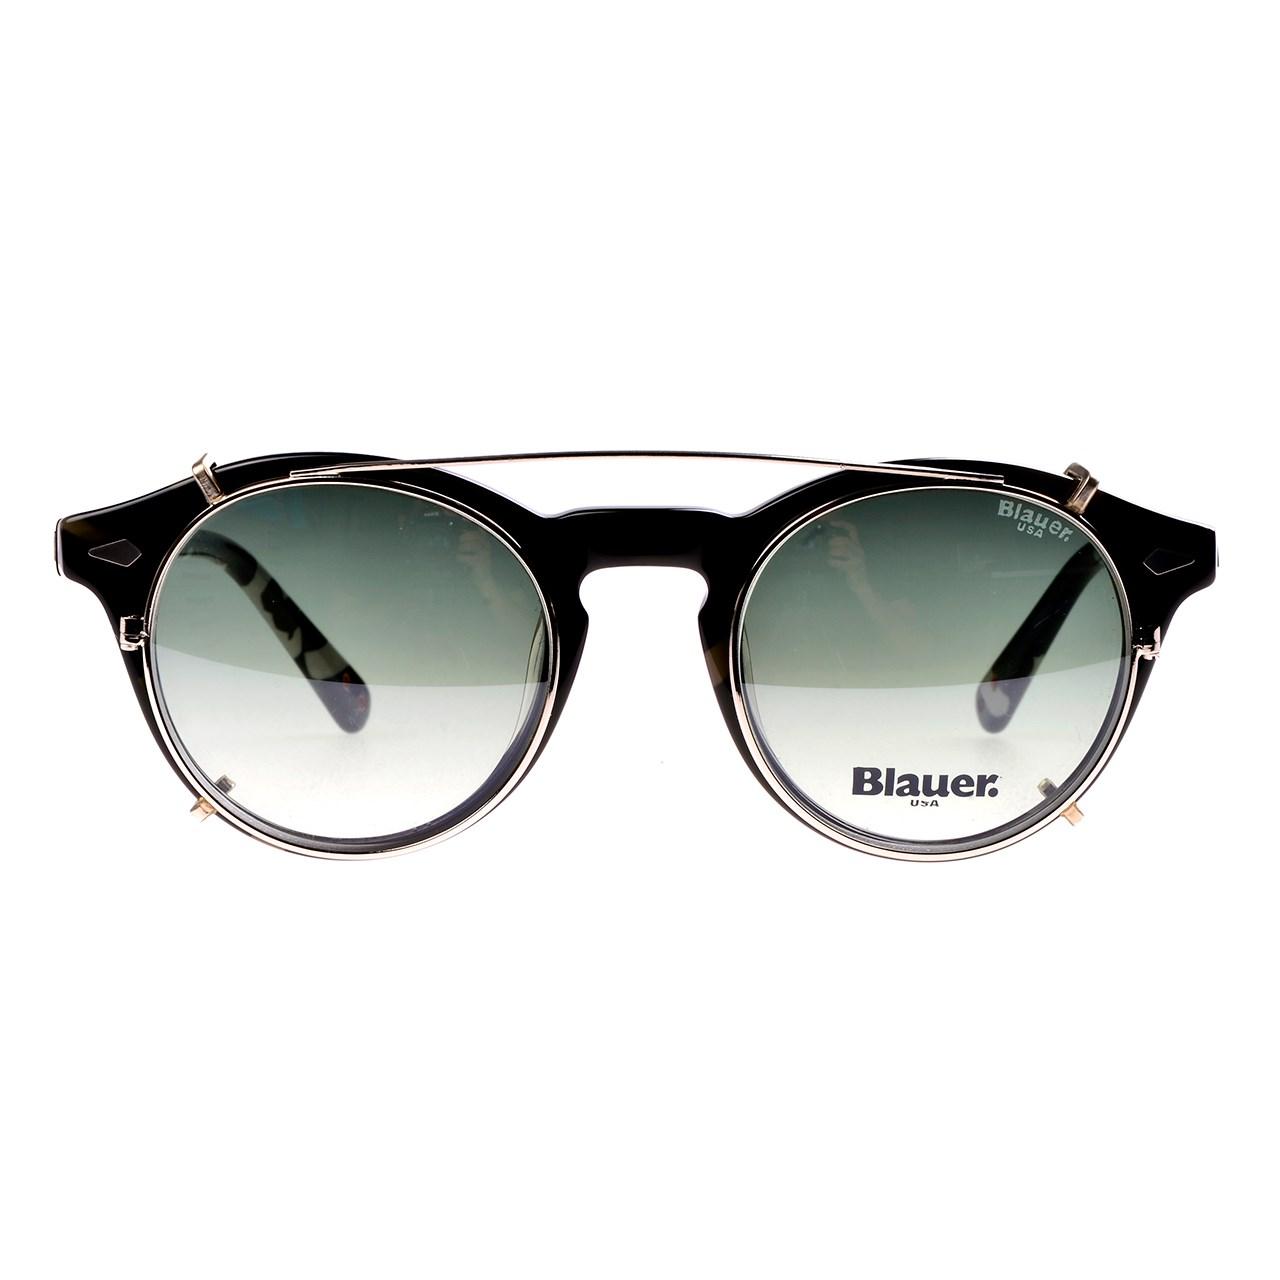 عینک آفتابی بلاور مدل BL007-05